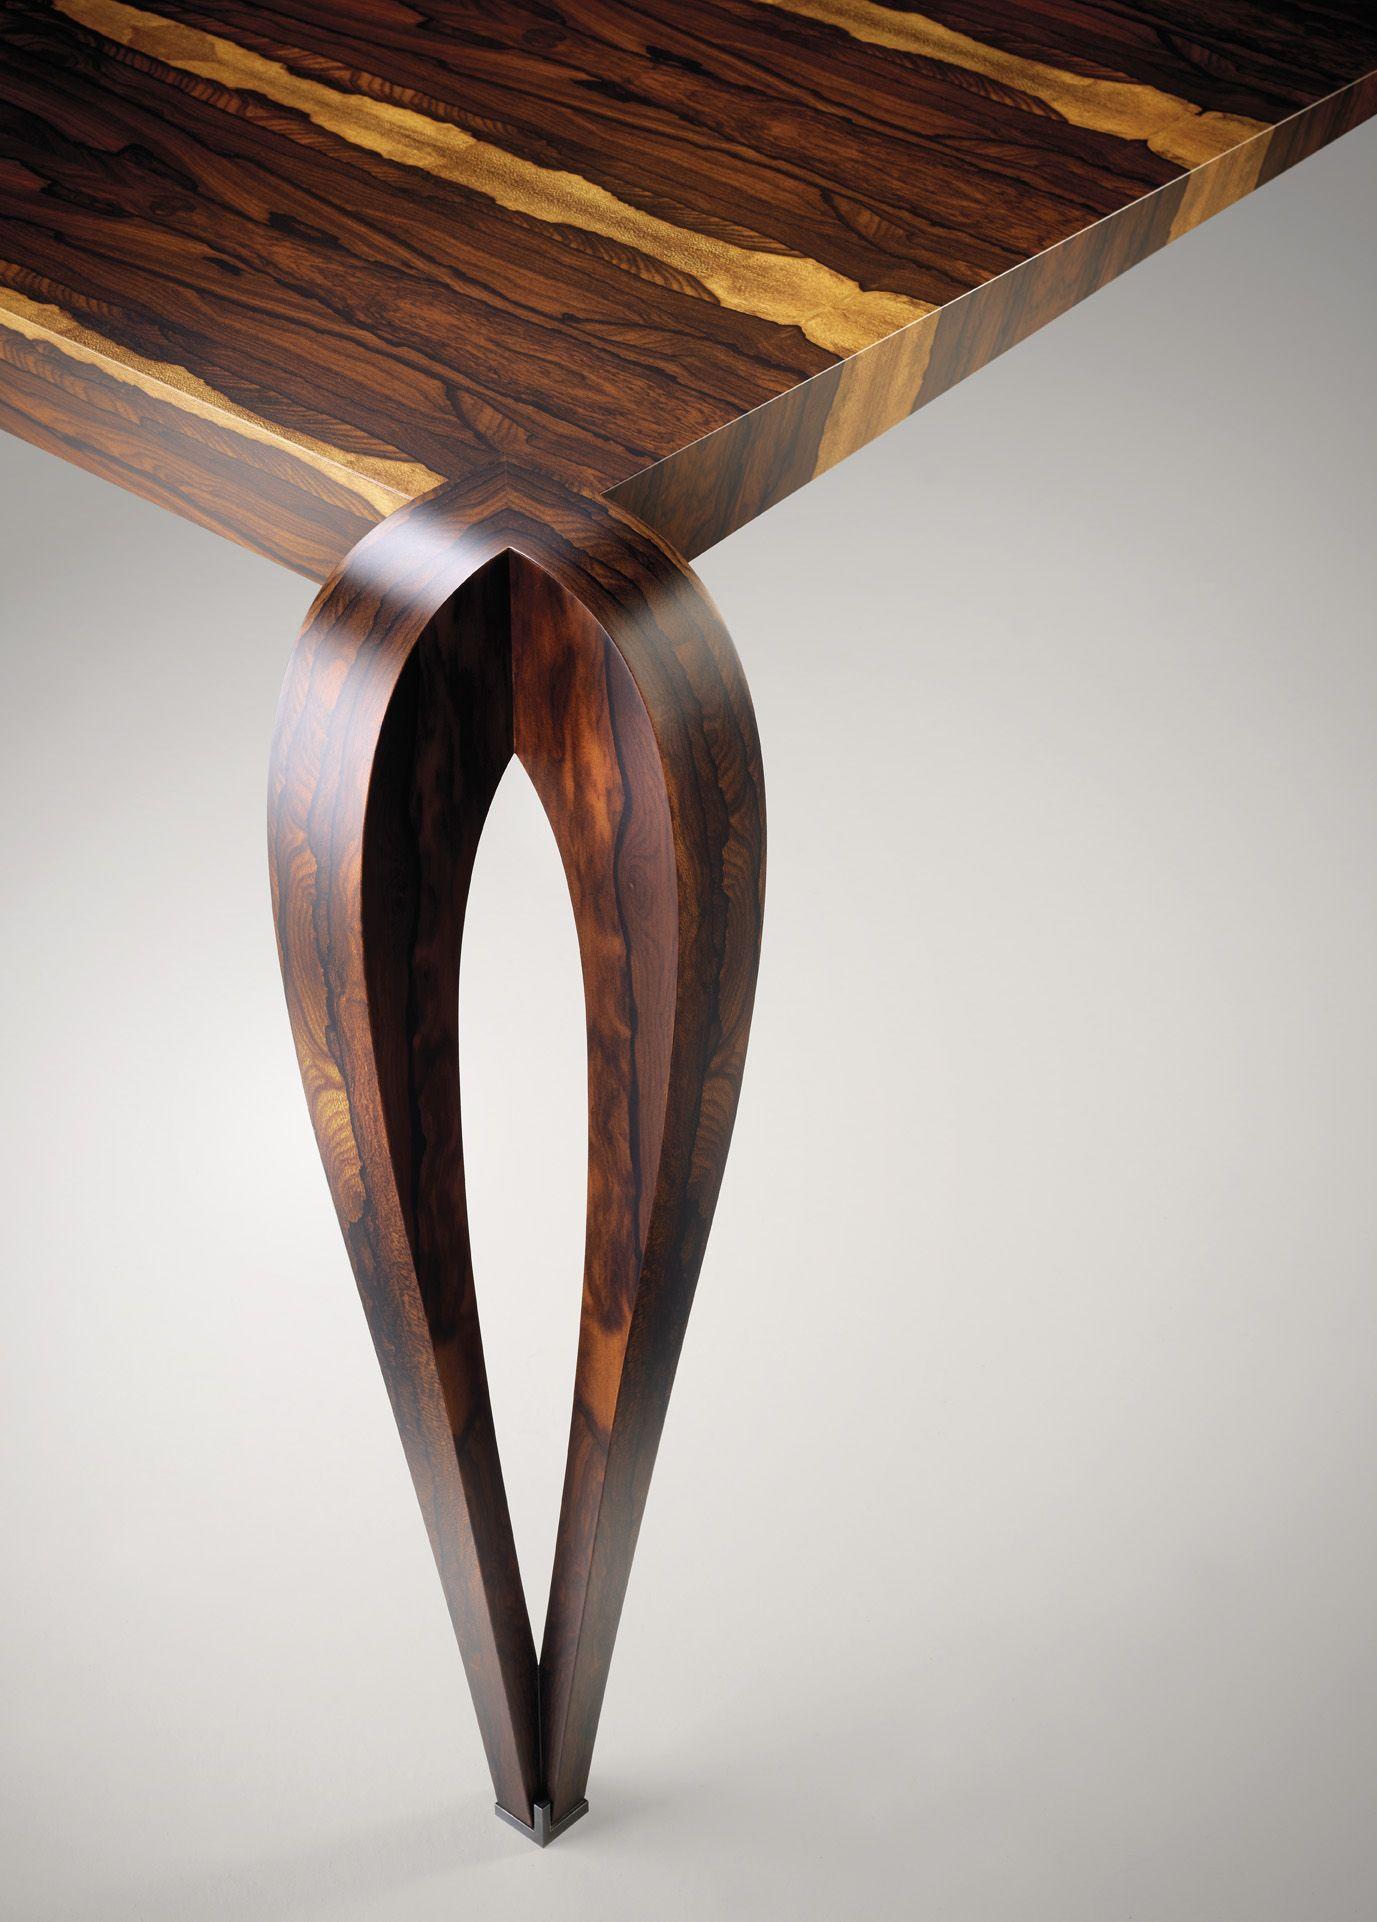 Table Remarquable Bois De Ziricote Paul Hoffmann Table Idees